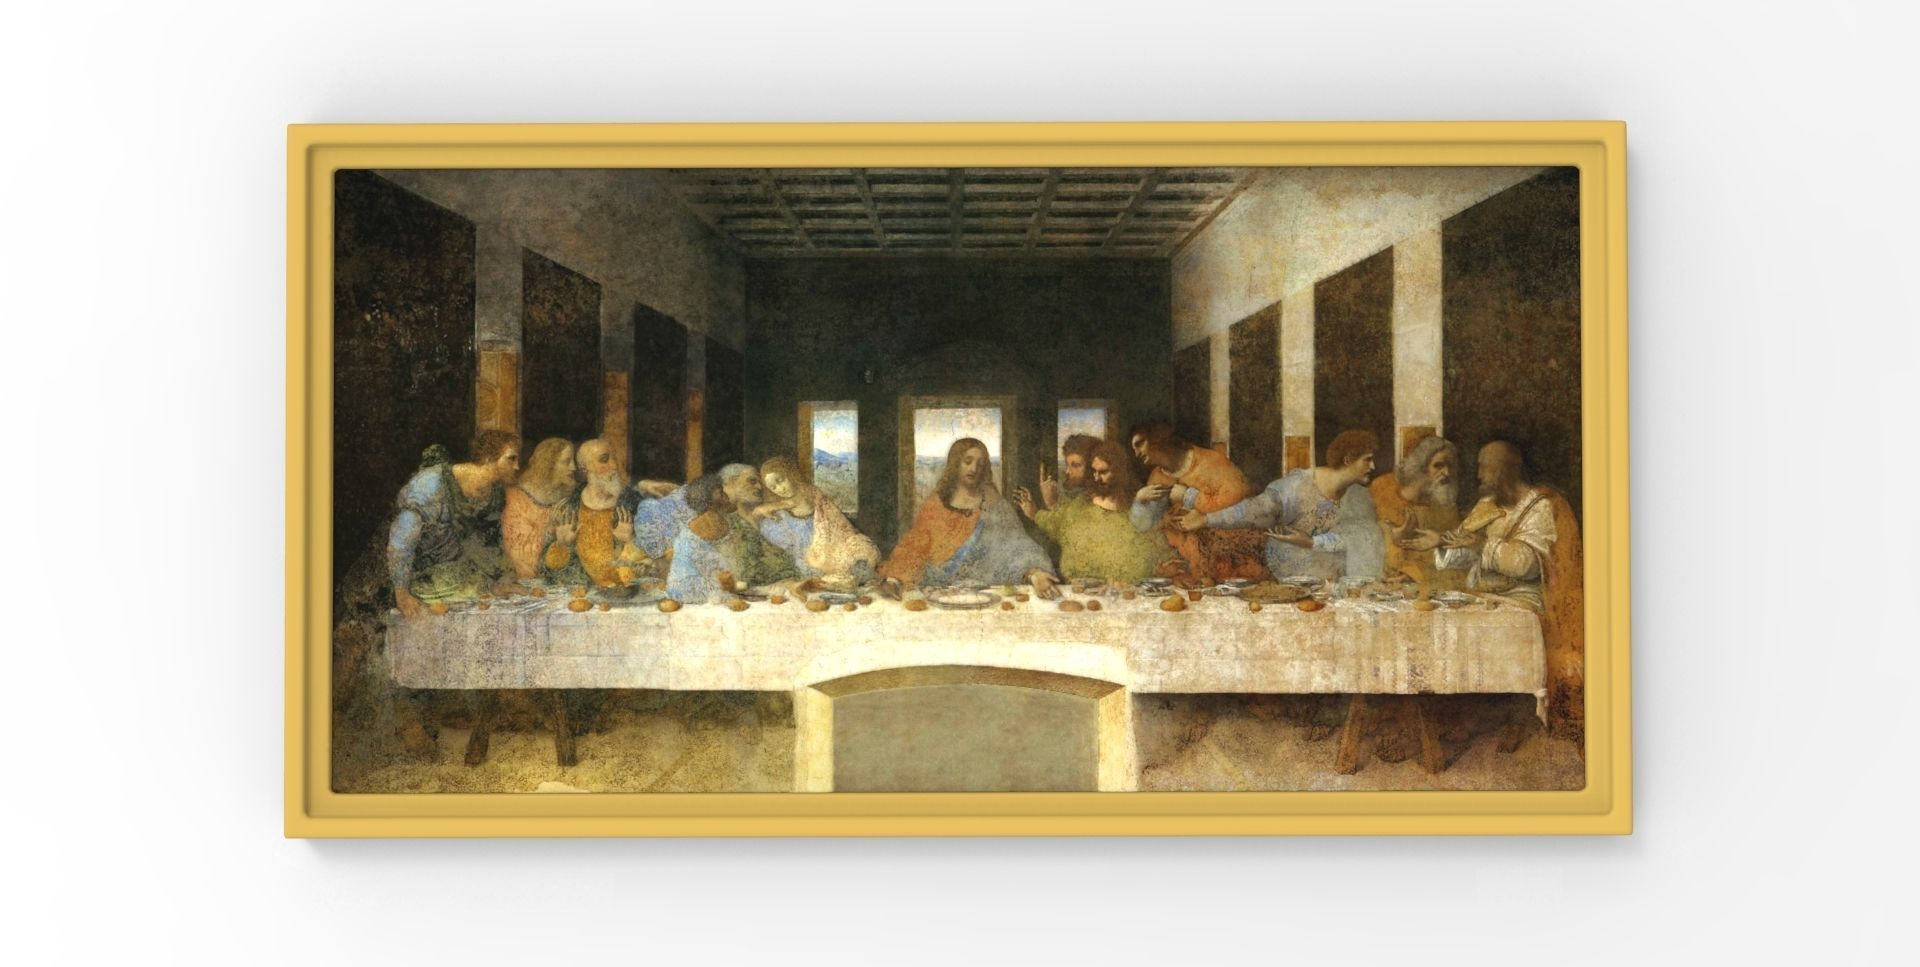 Leonardo Da Vinci The Last Supper Coloring Page The Last Supper Painting Leonardo Da Vinci For 3d Printing 3d Print Model